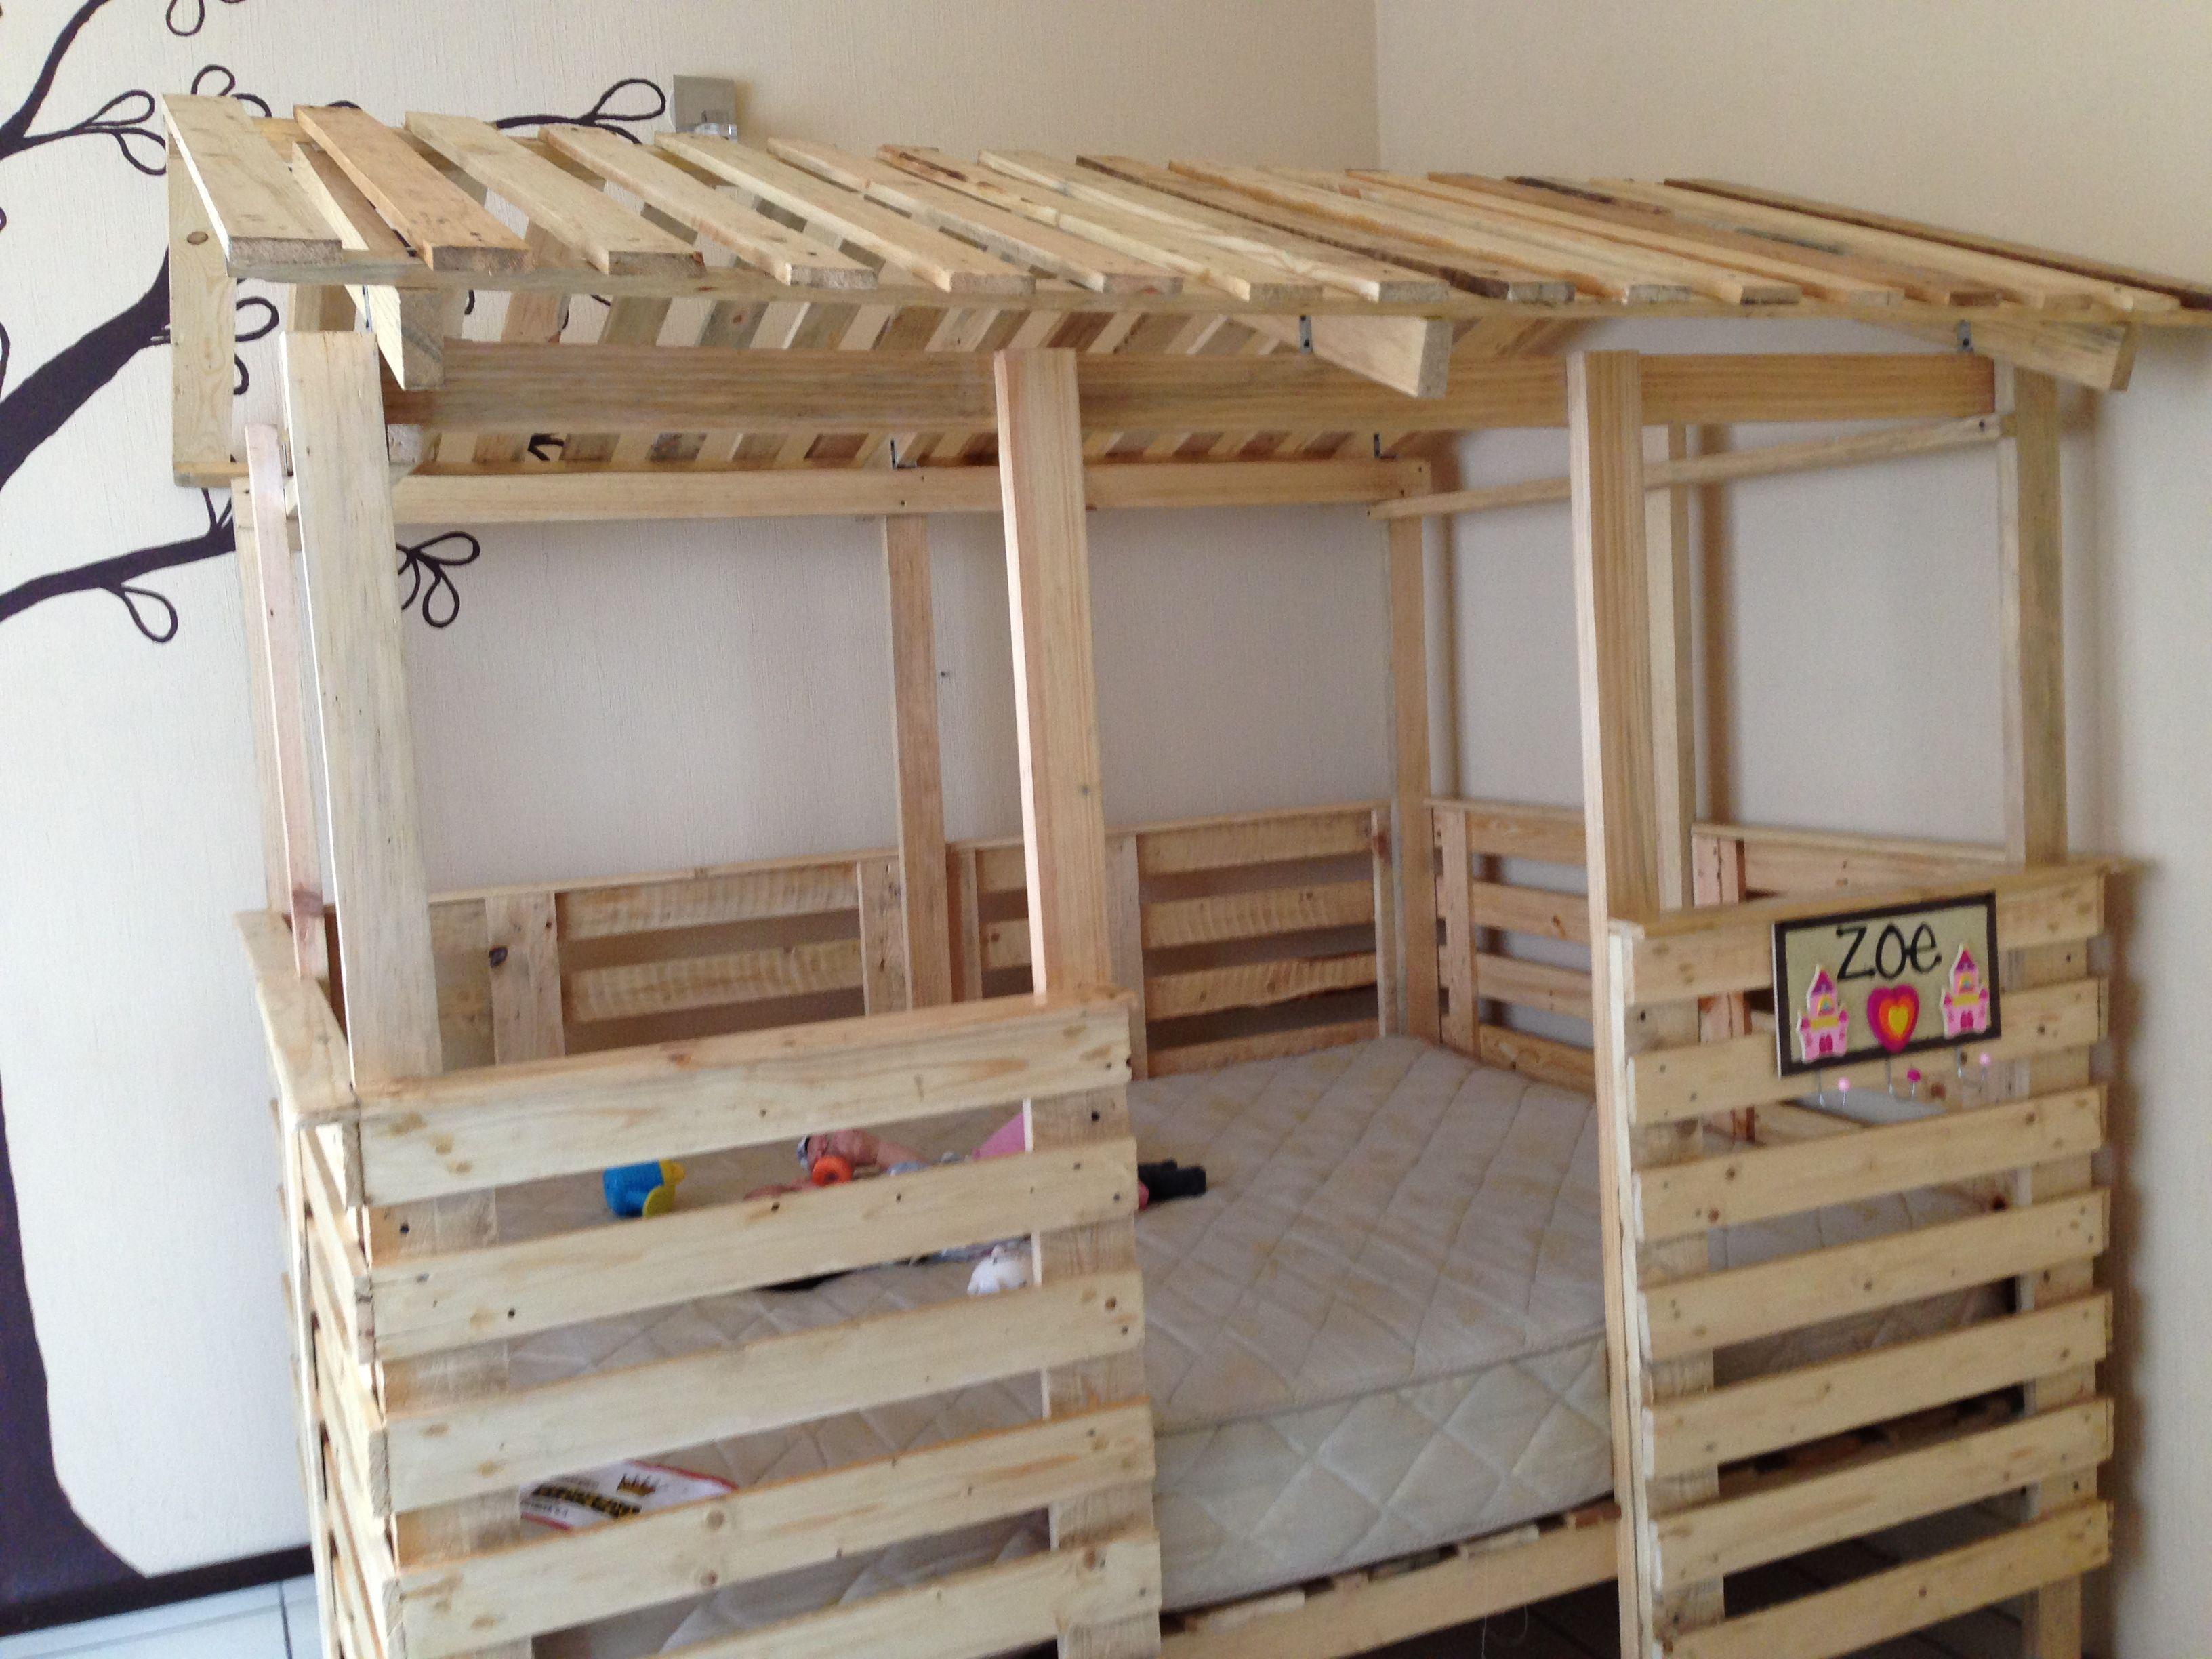 Casa Cama Hecha De Pallets Tama 241 O Full House Bed Made Out